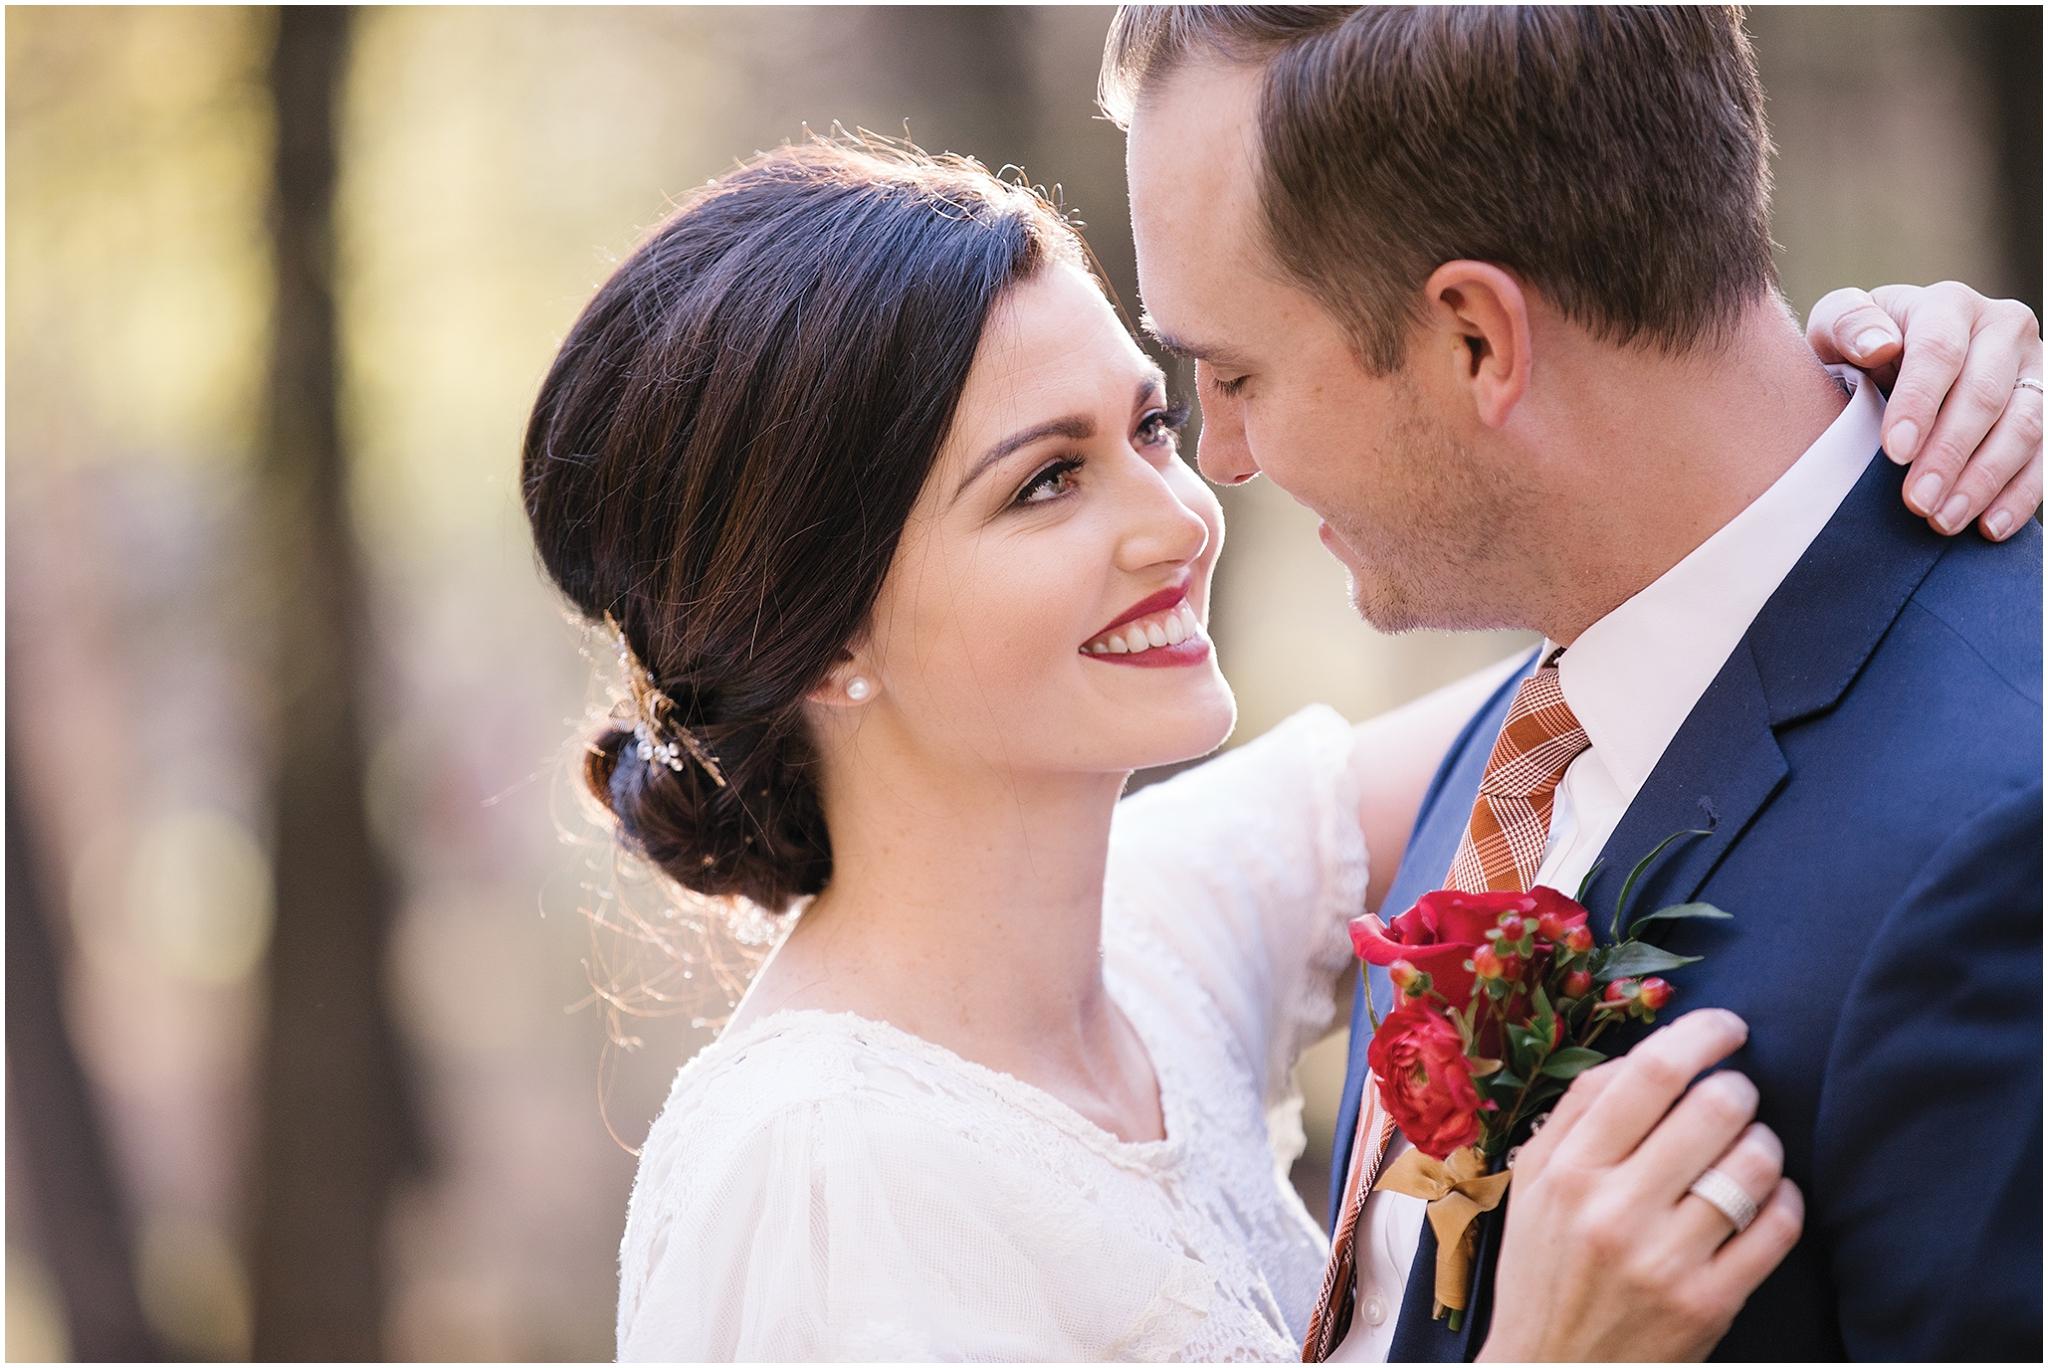 748A6836-EditWEB_Lizzie-B-Imagery-Utah-Wedding-Photographer-Salt-Lake-City-Park-City-timpanogos-Utah-Temple.jpg